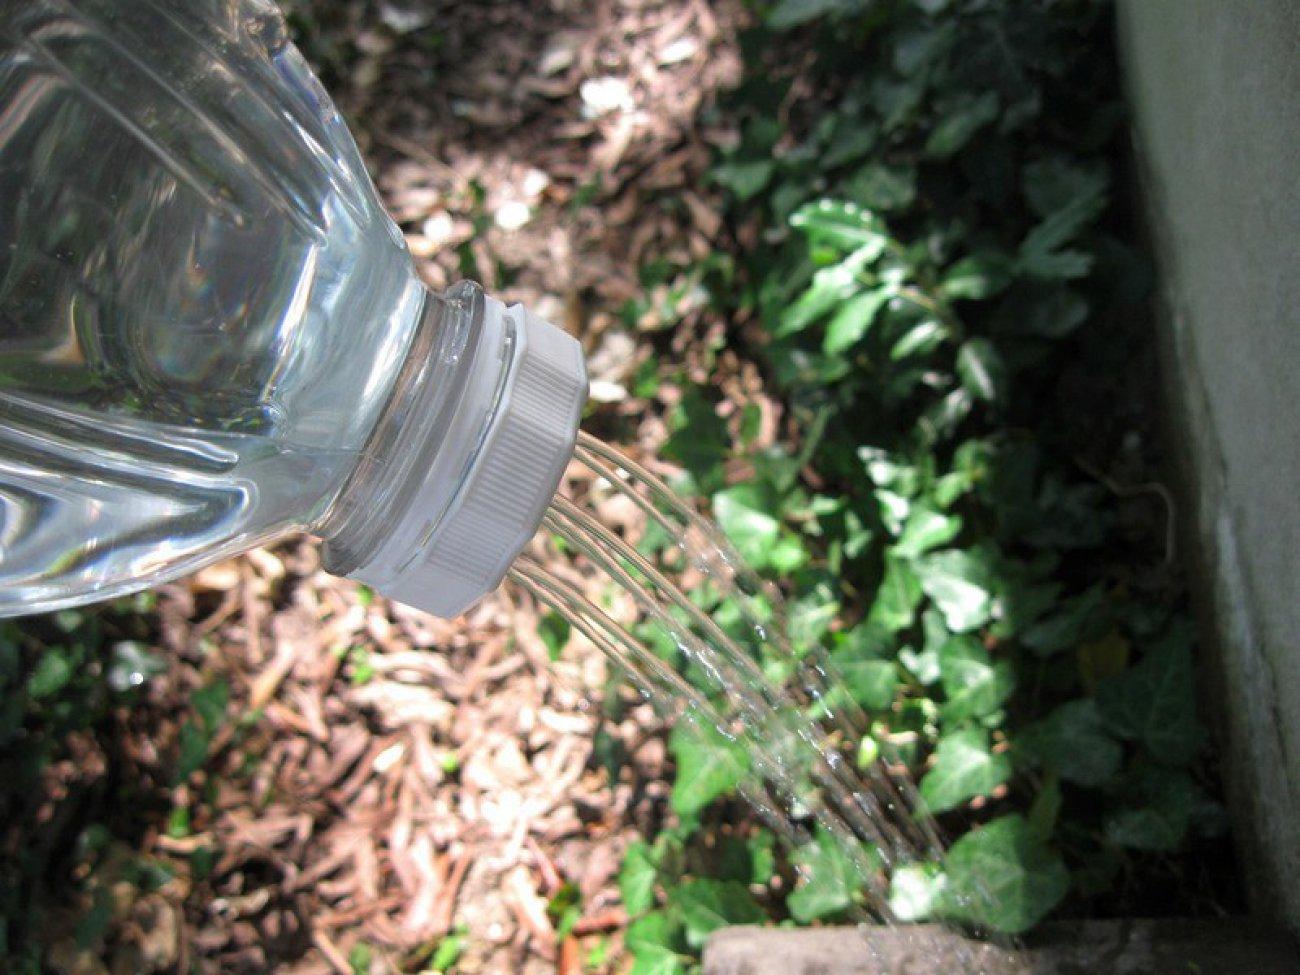 26-facons-originales-de-recycler-vos-bouteilles-en-plastique-113188